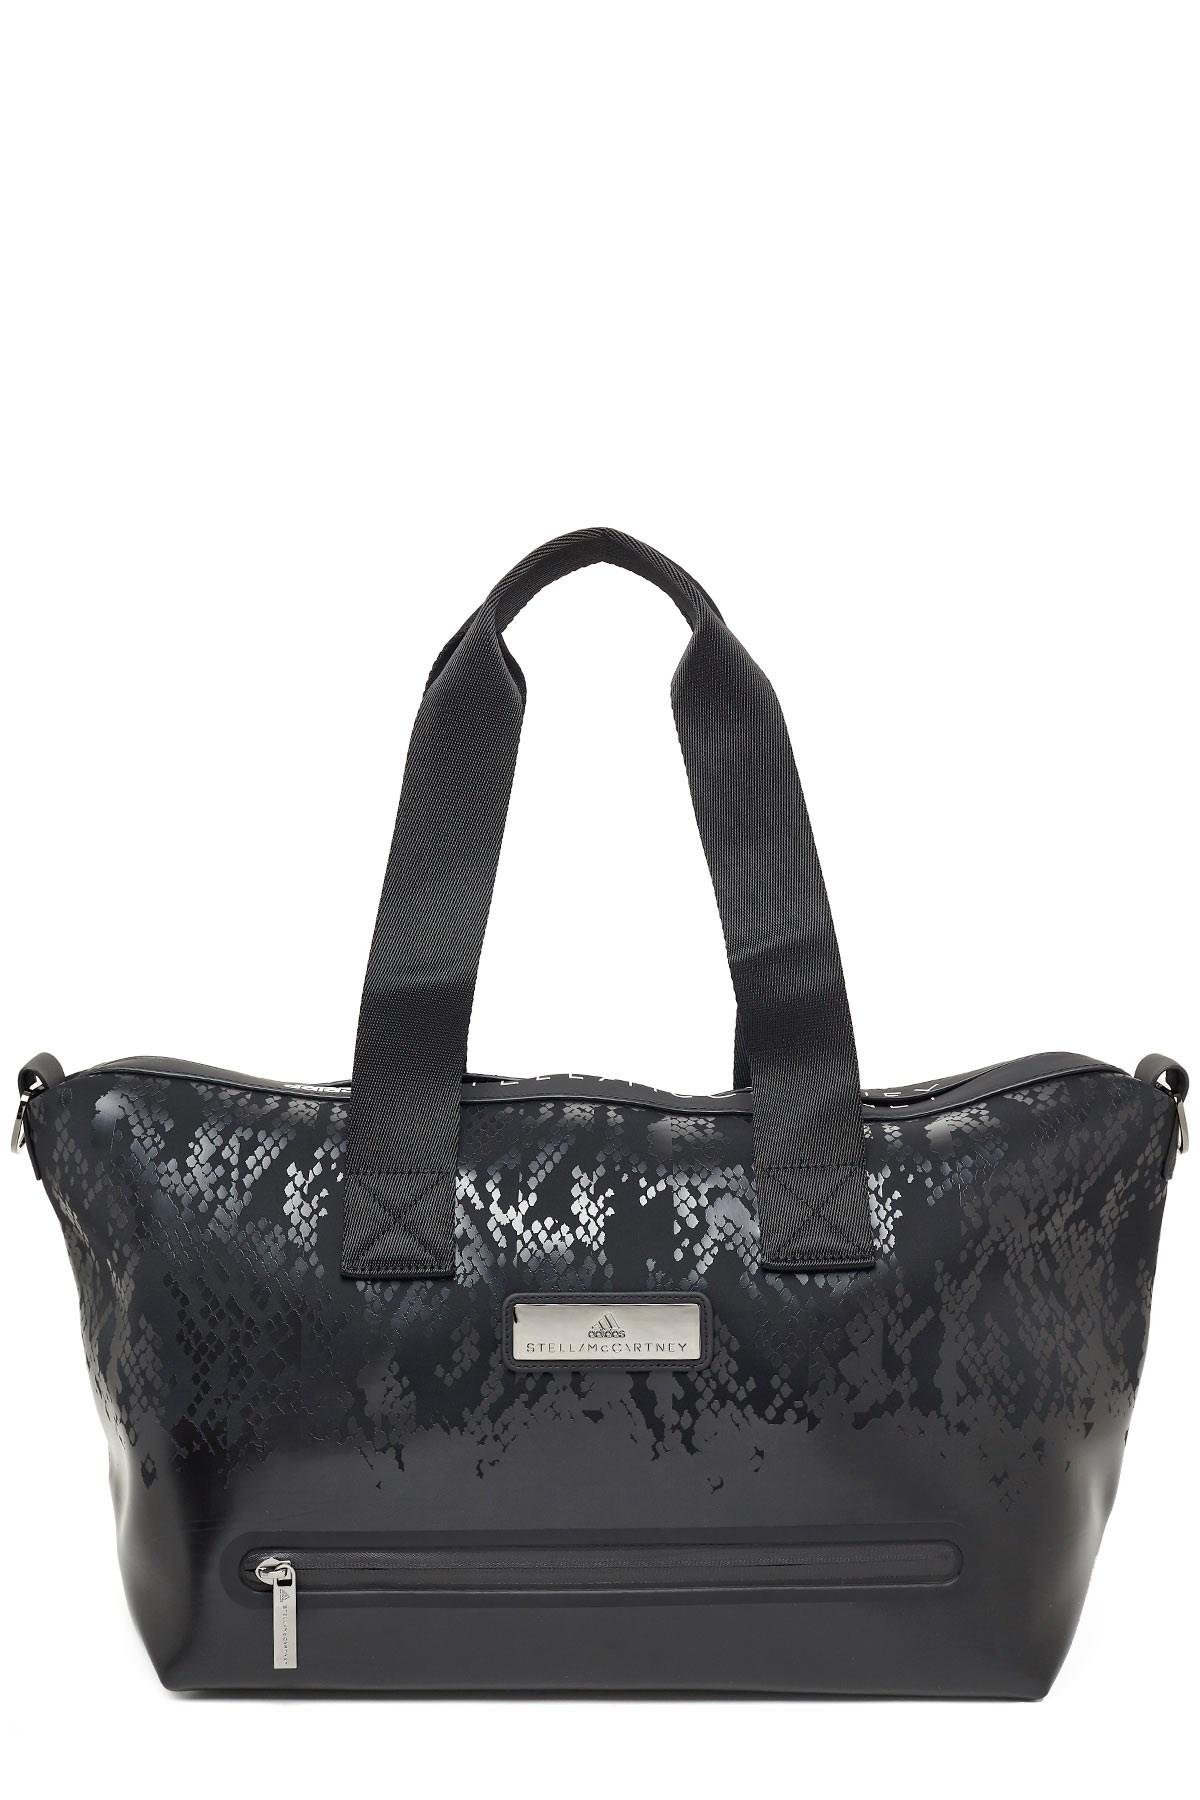 eae53136ac66 adidas by stella mccartney  Studio  gym bag available on julian ...